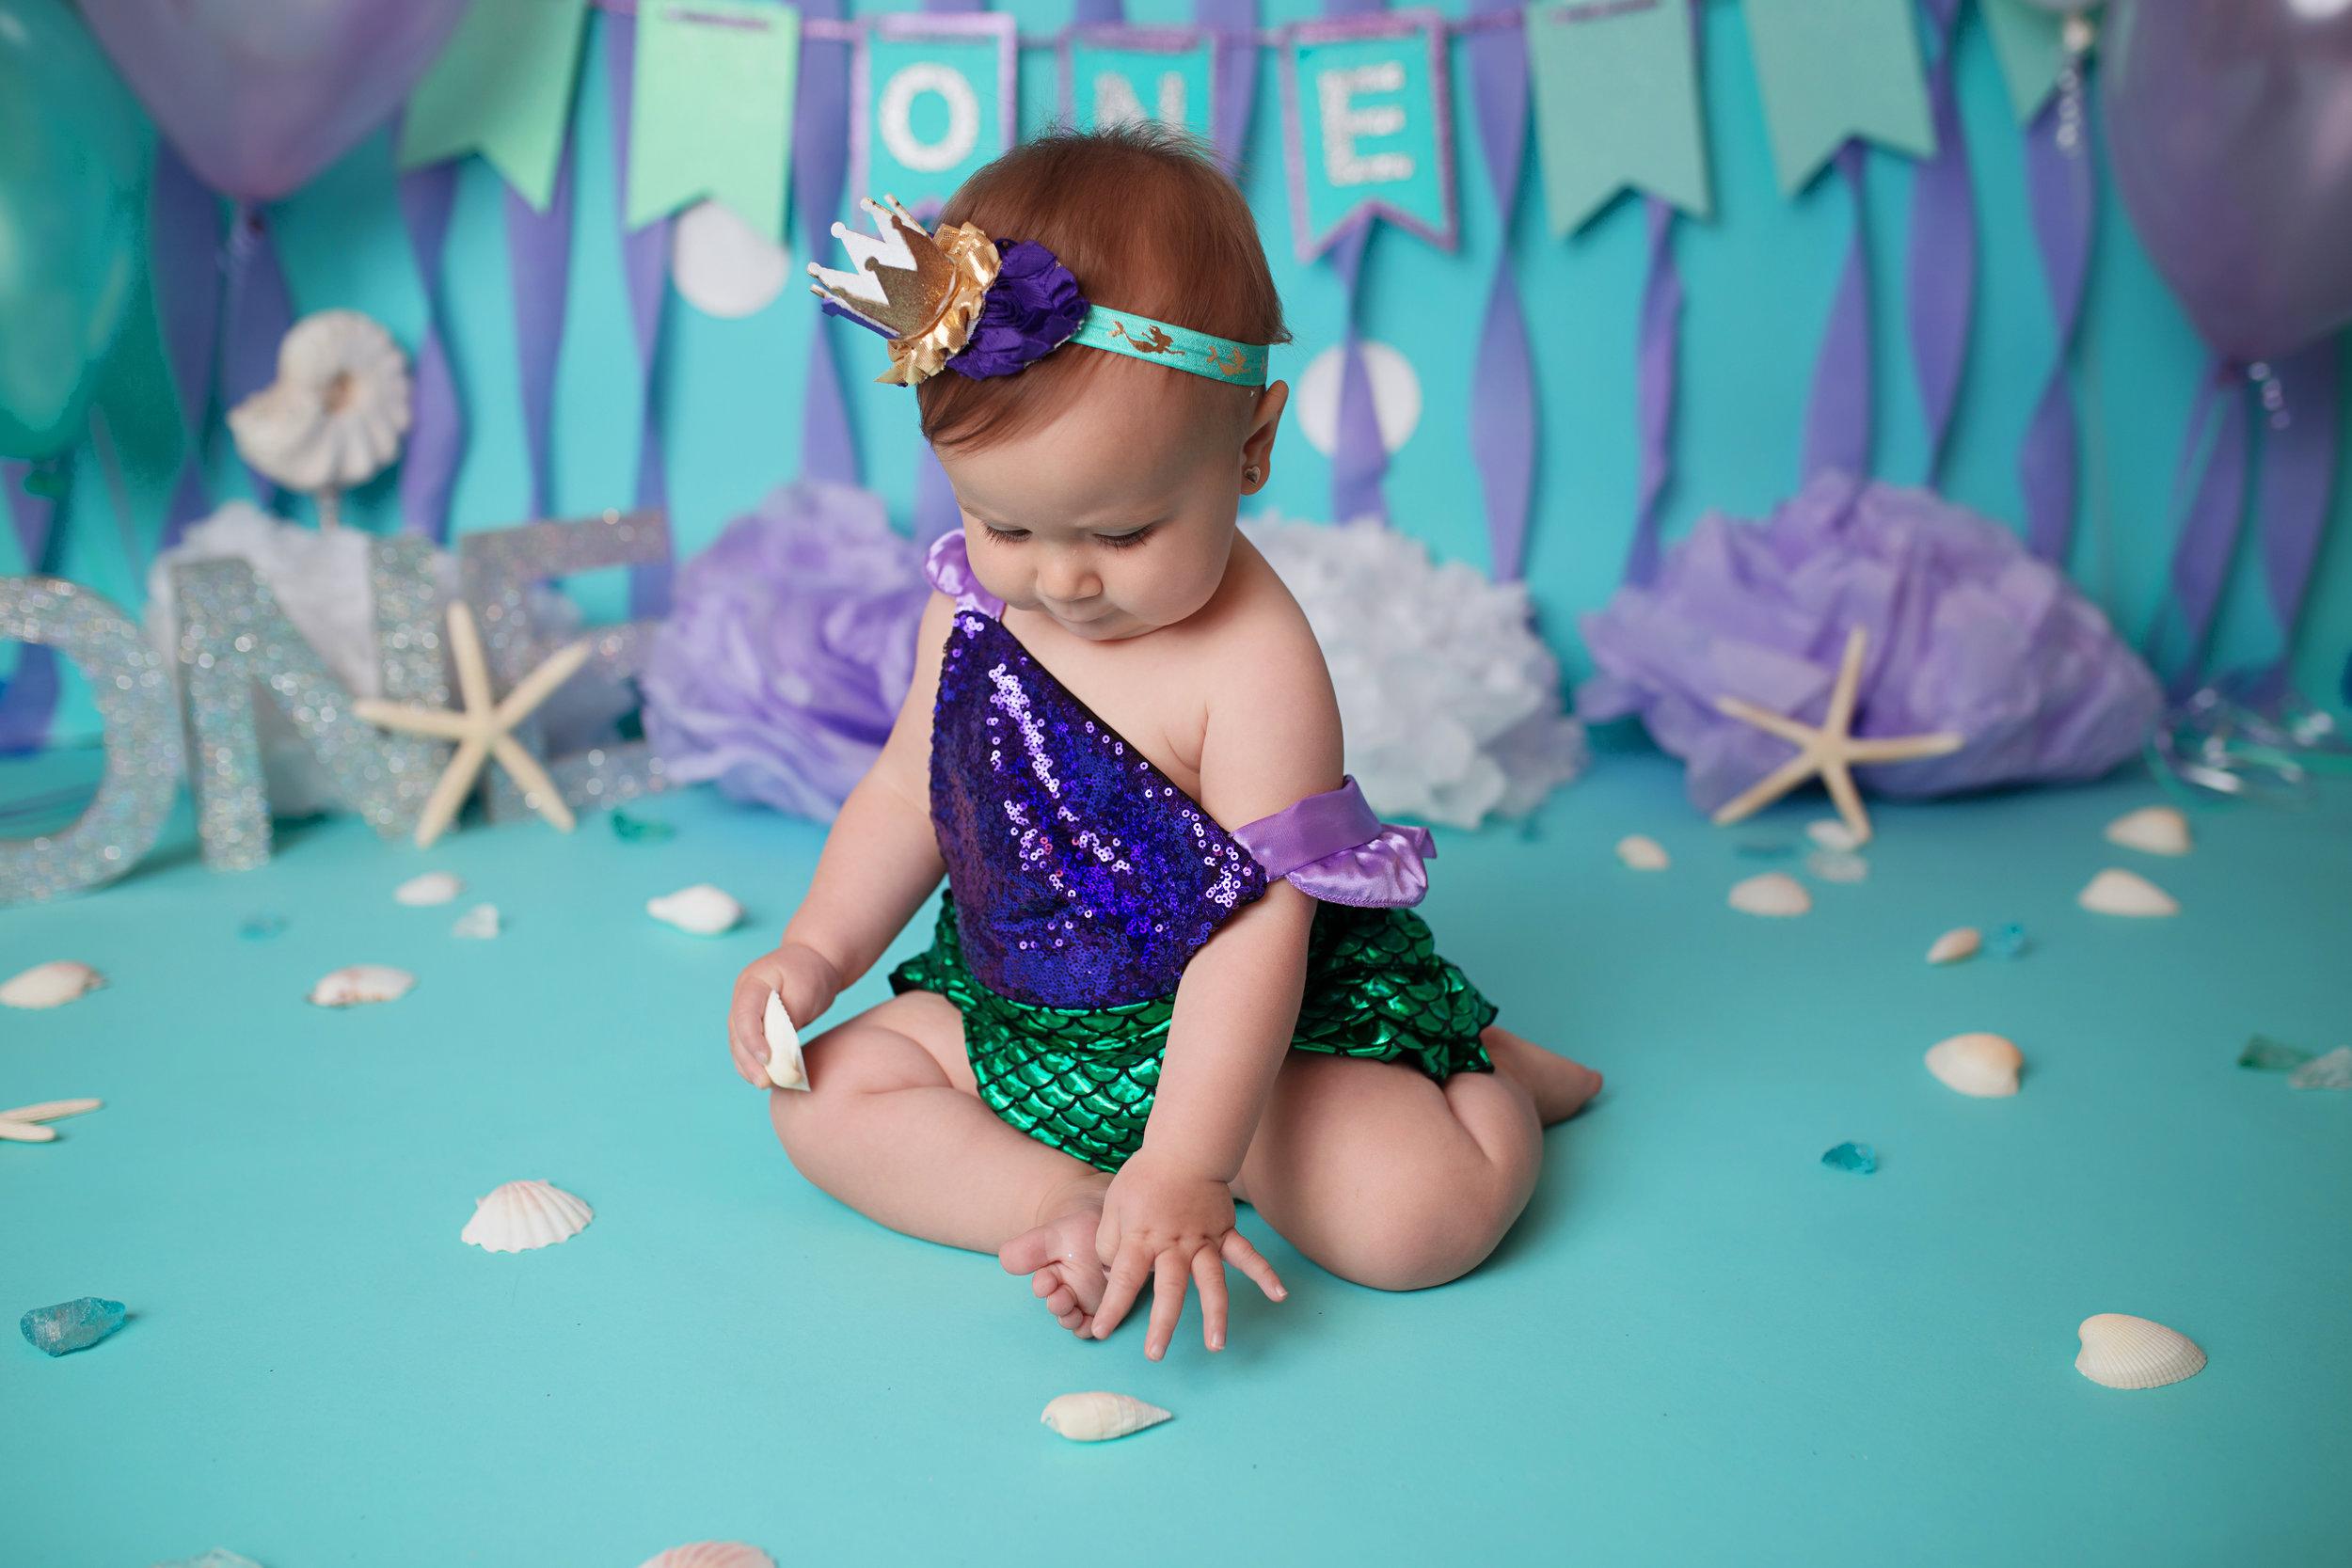 anchorage-cake-smash-photography-2.jpg